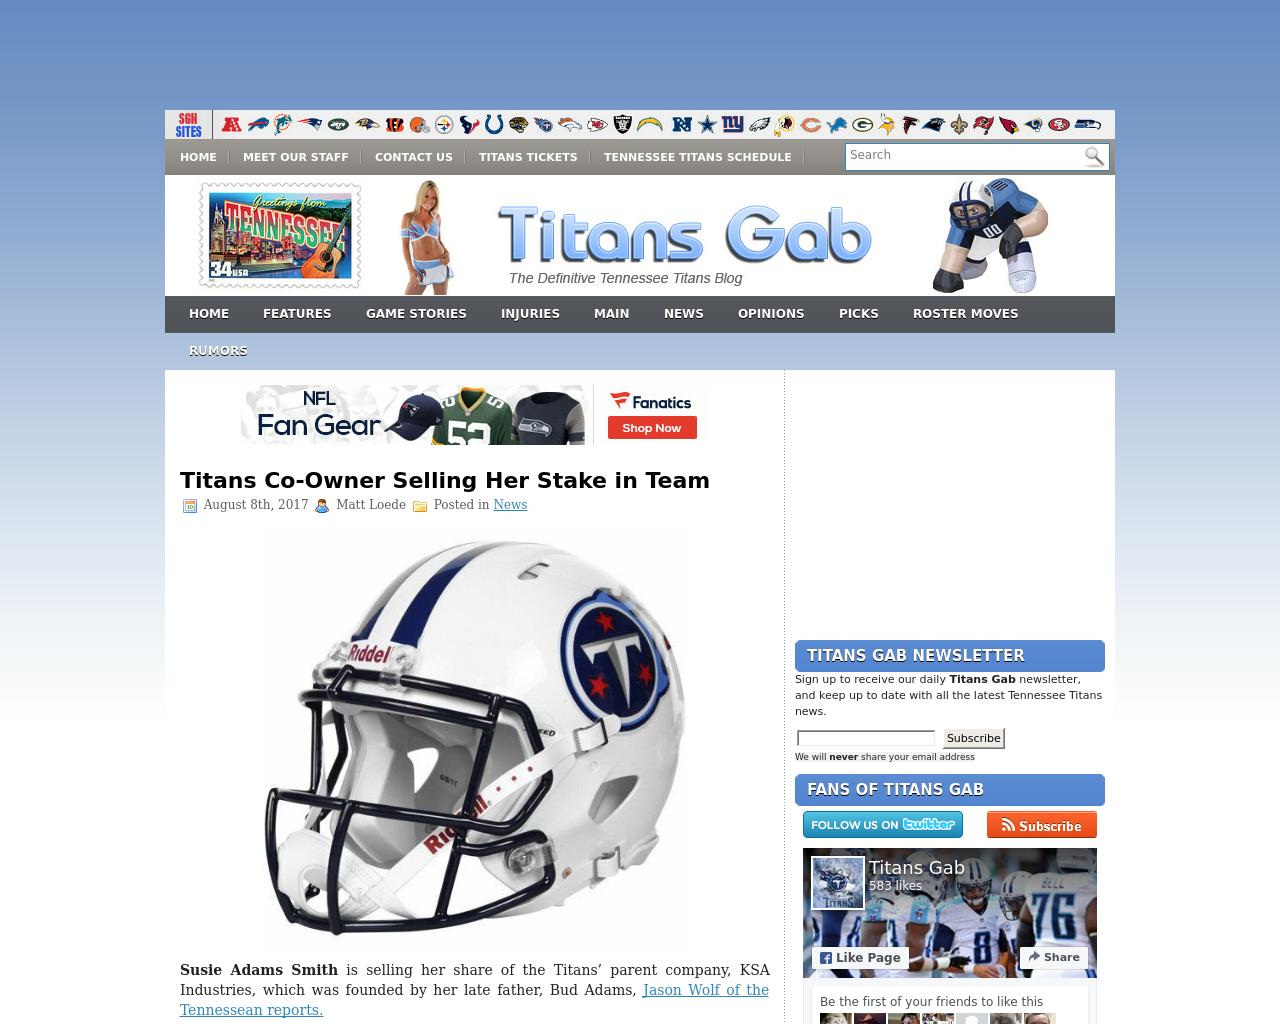 Titans-Gab-Advertising-Reviews-Pricing